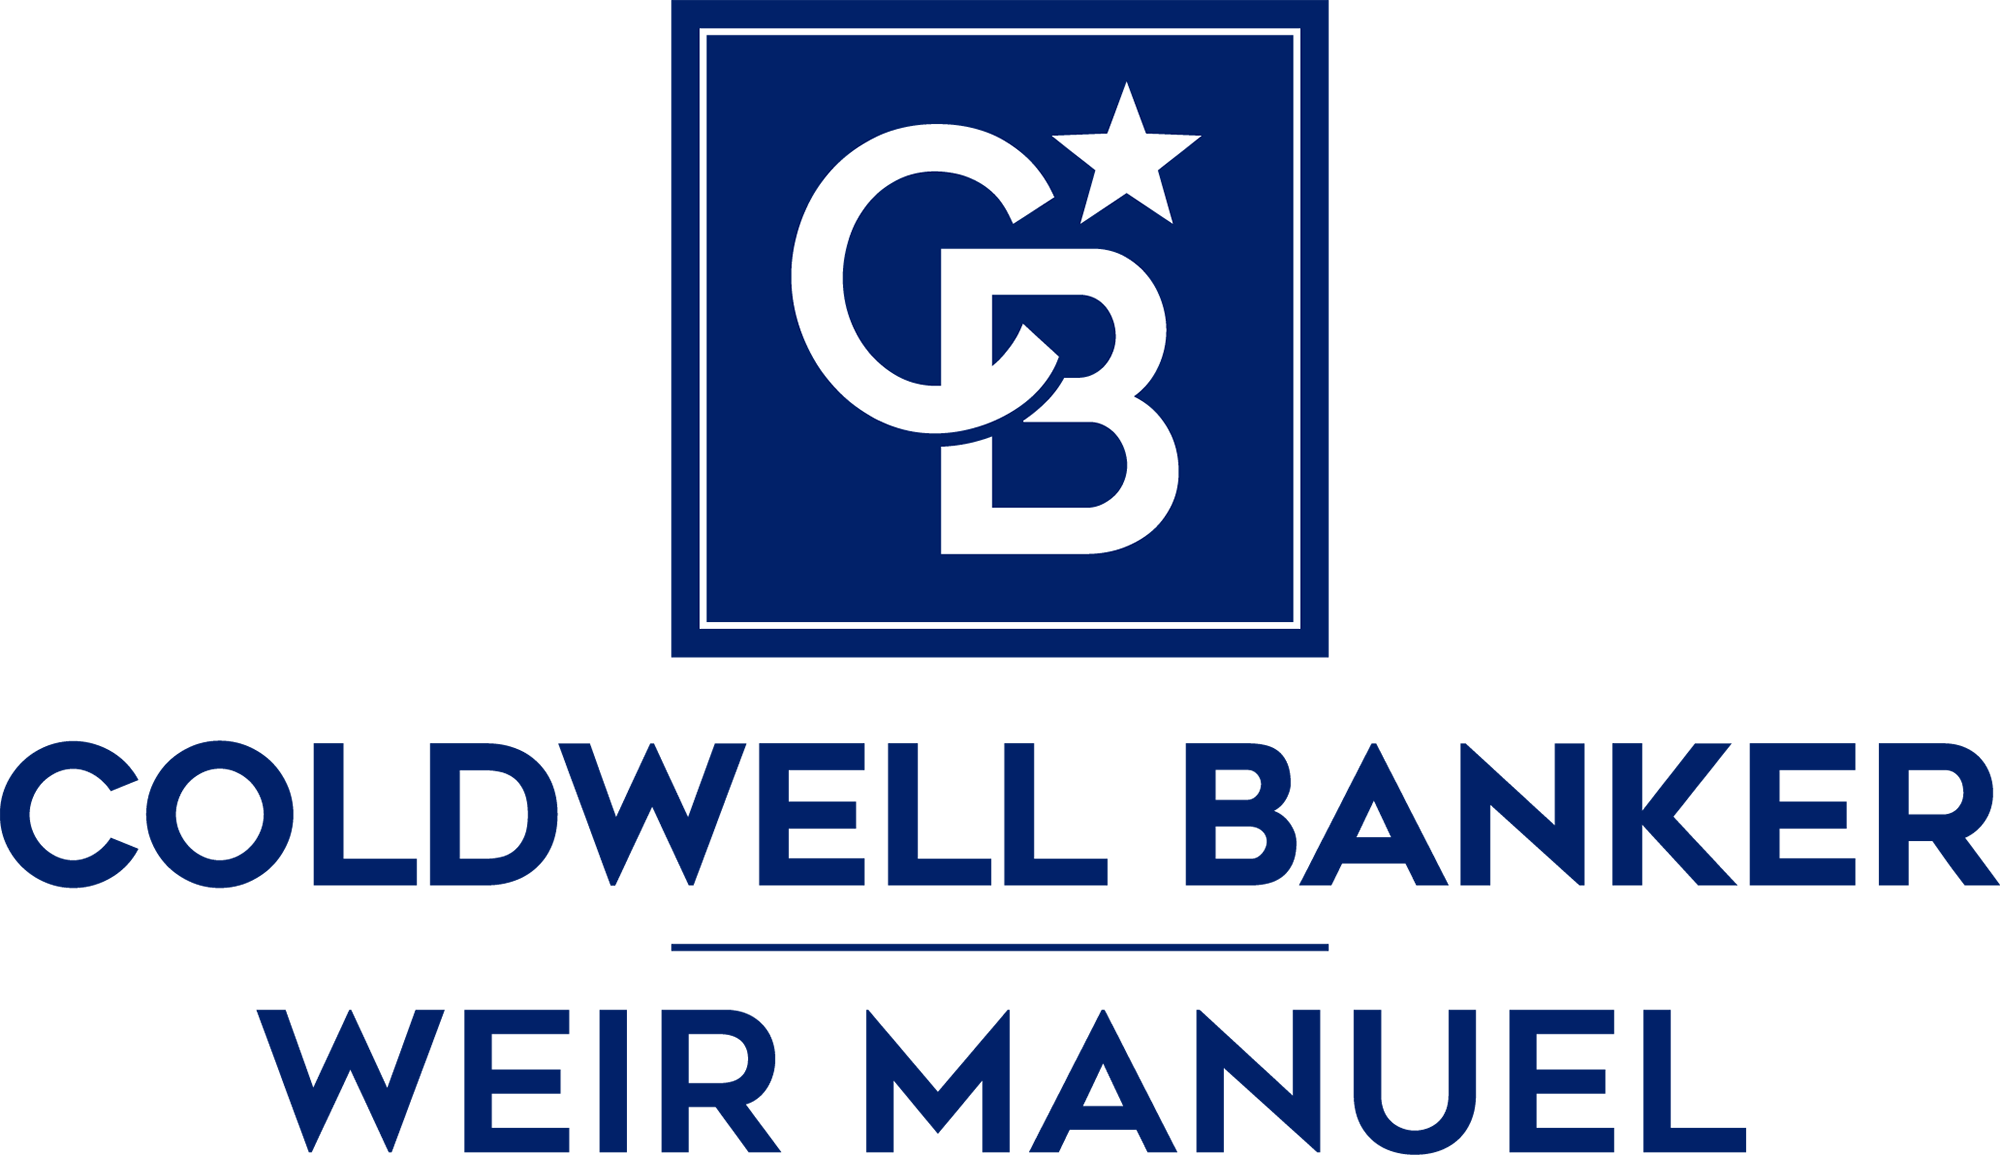 Brieanna Bacon - Coldwell Banker Weir Manuel Logo